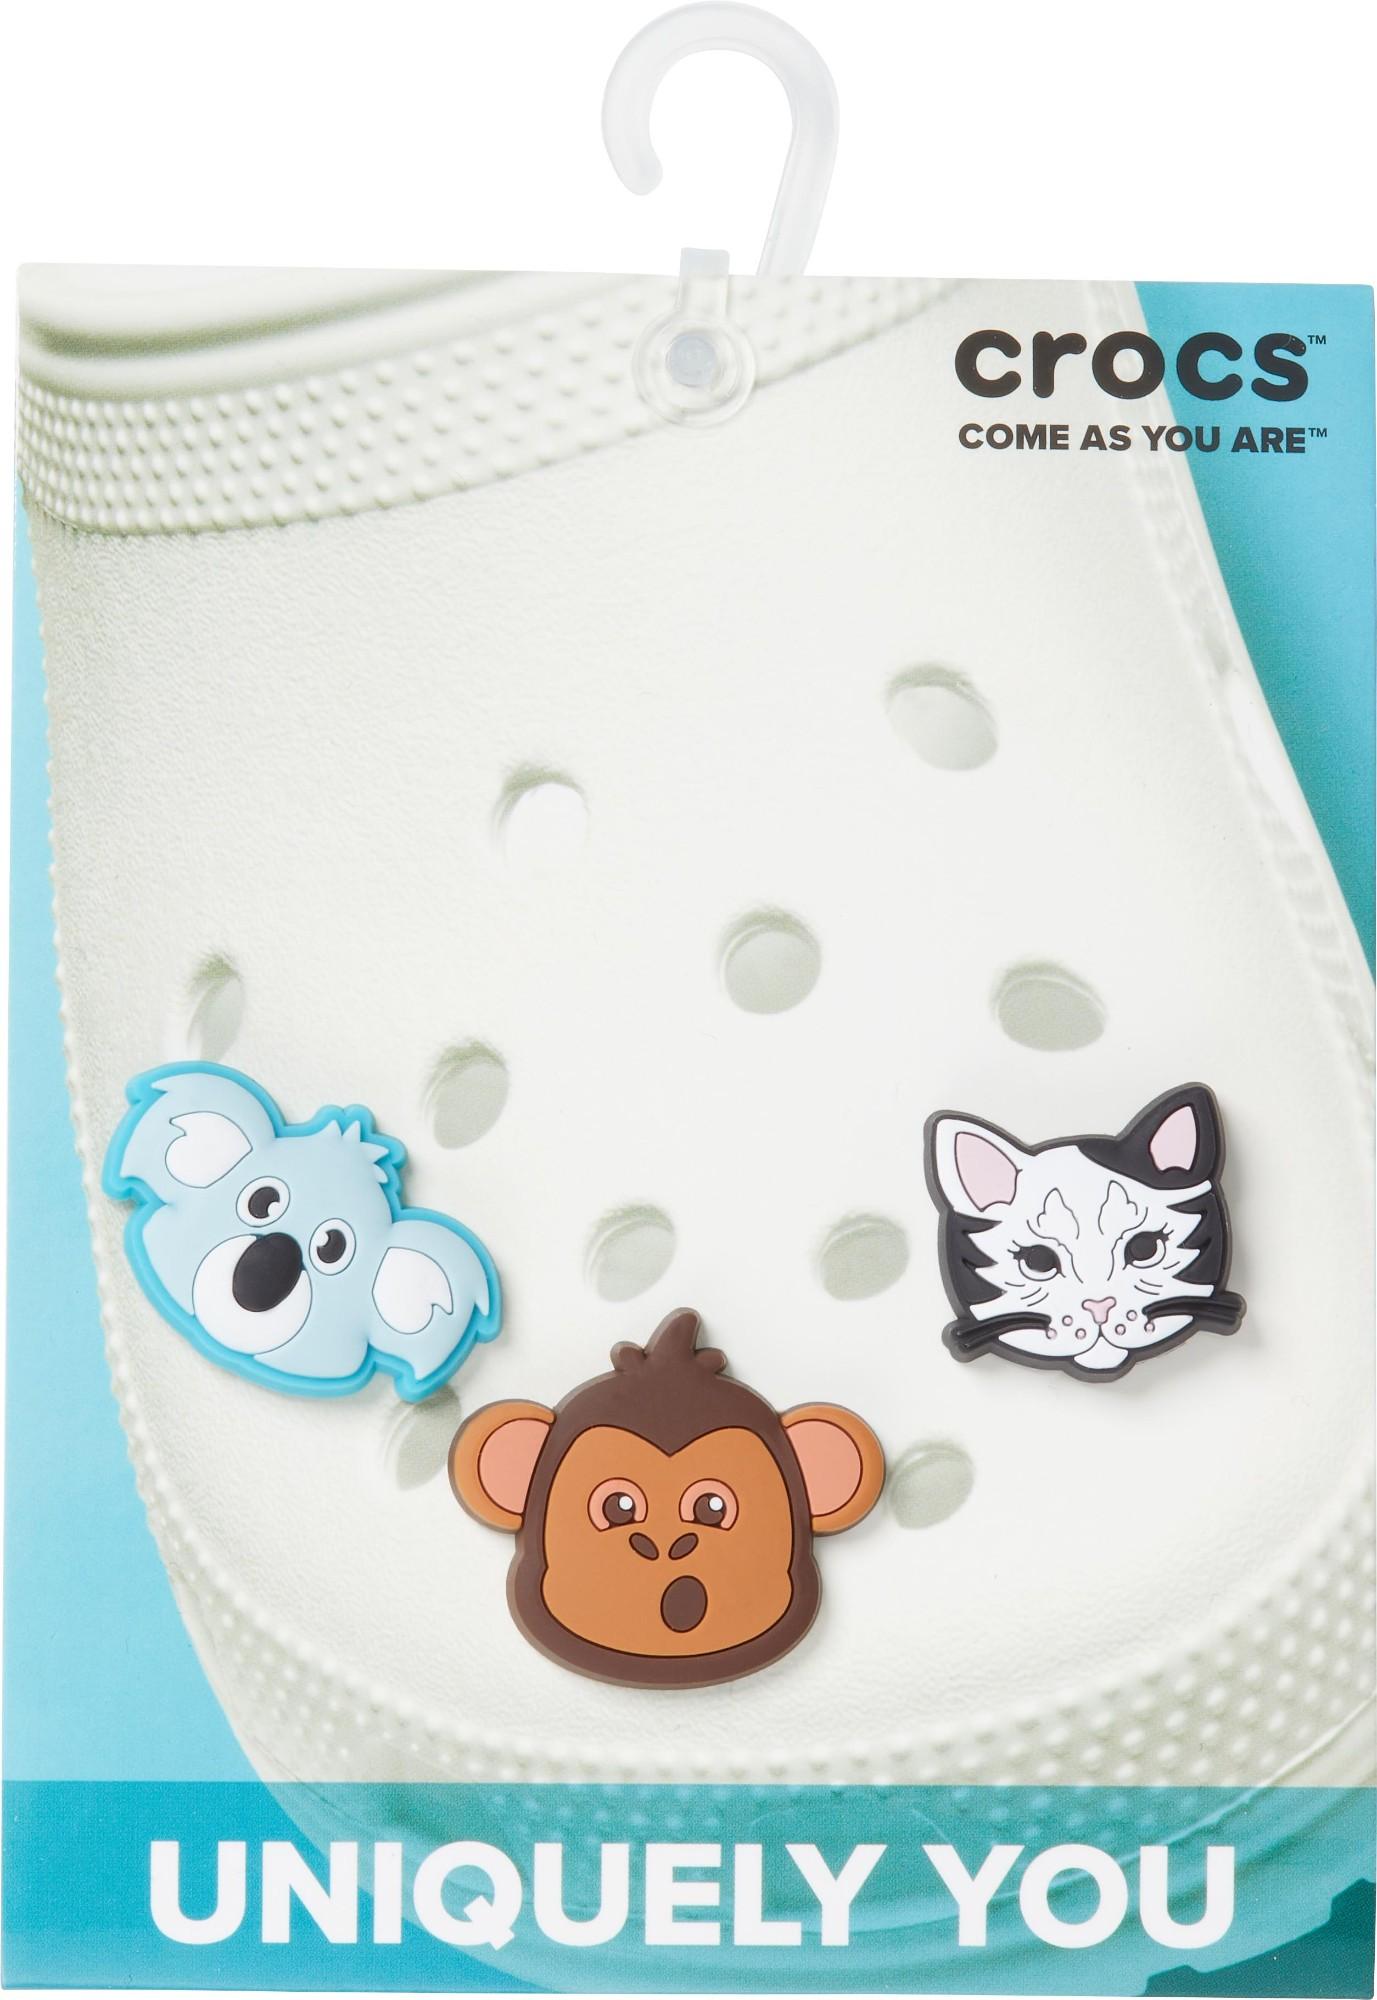 Crocs™ Crocs TRENDY ANIMAL 3 PACK G0702700-MU